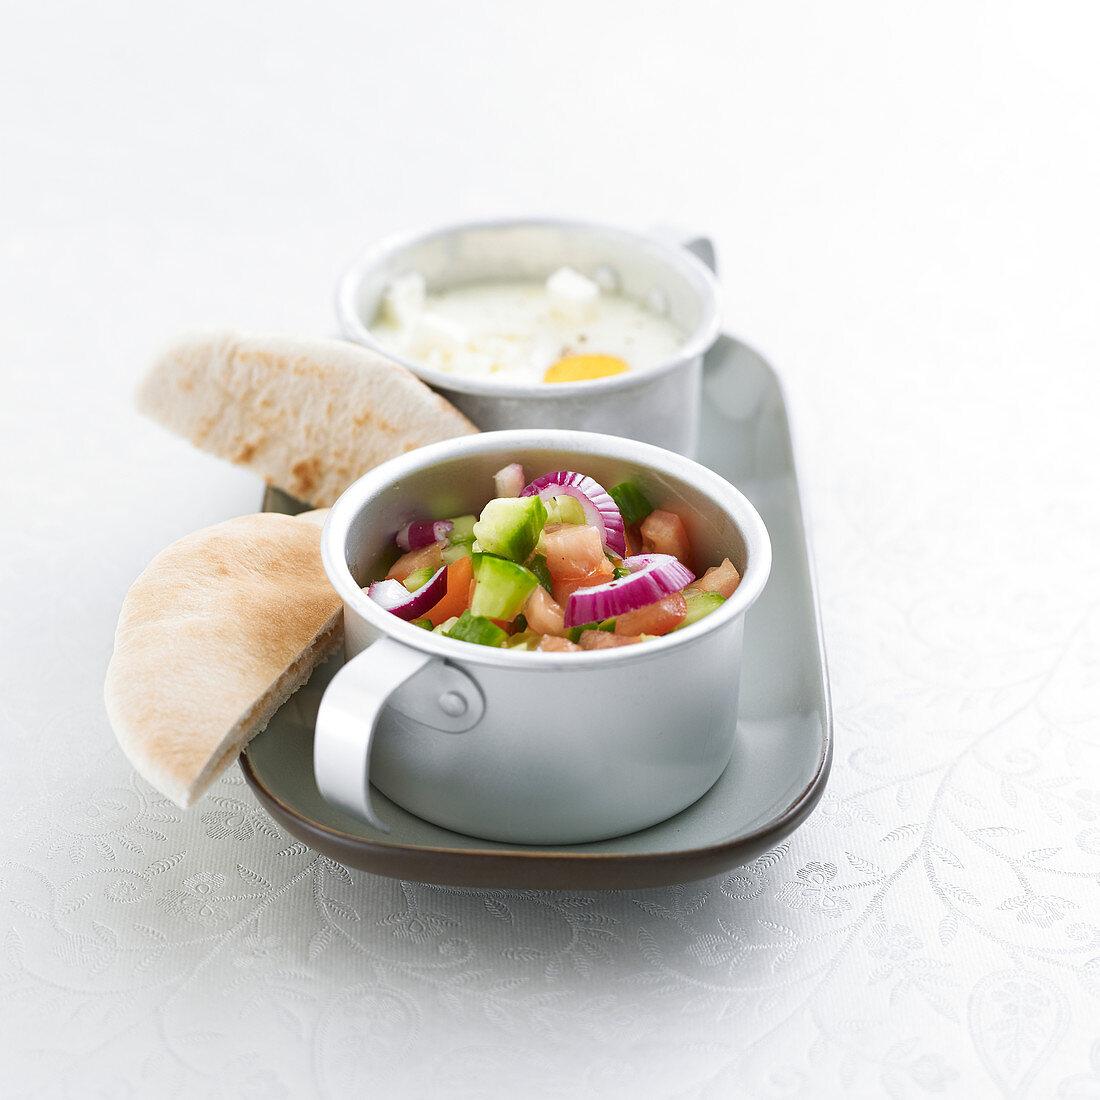 Cretan-style shirred eggs